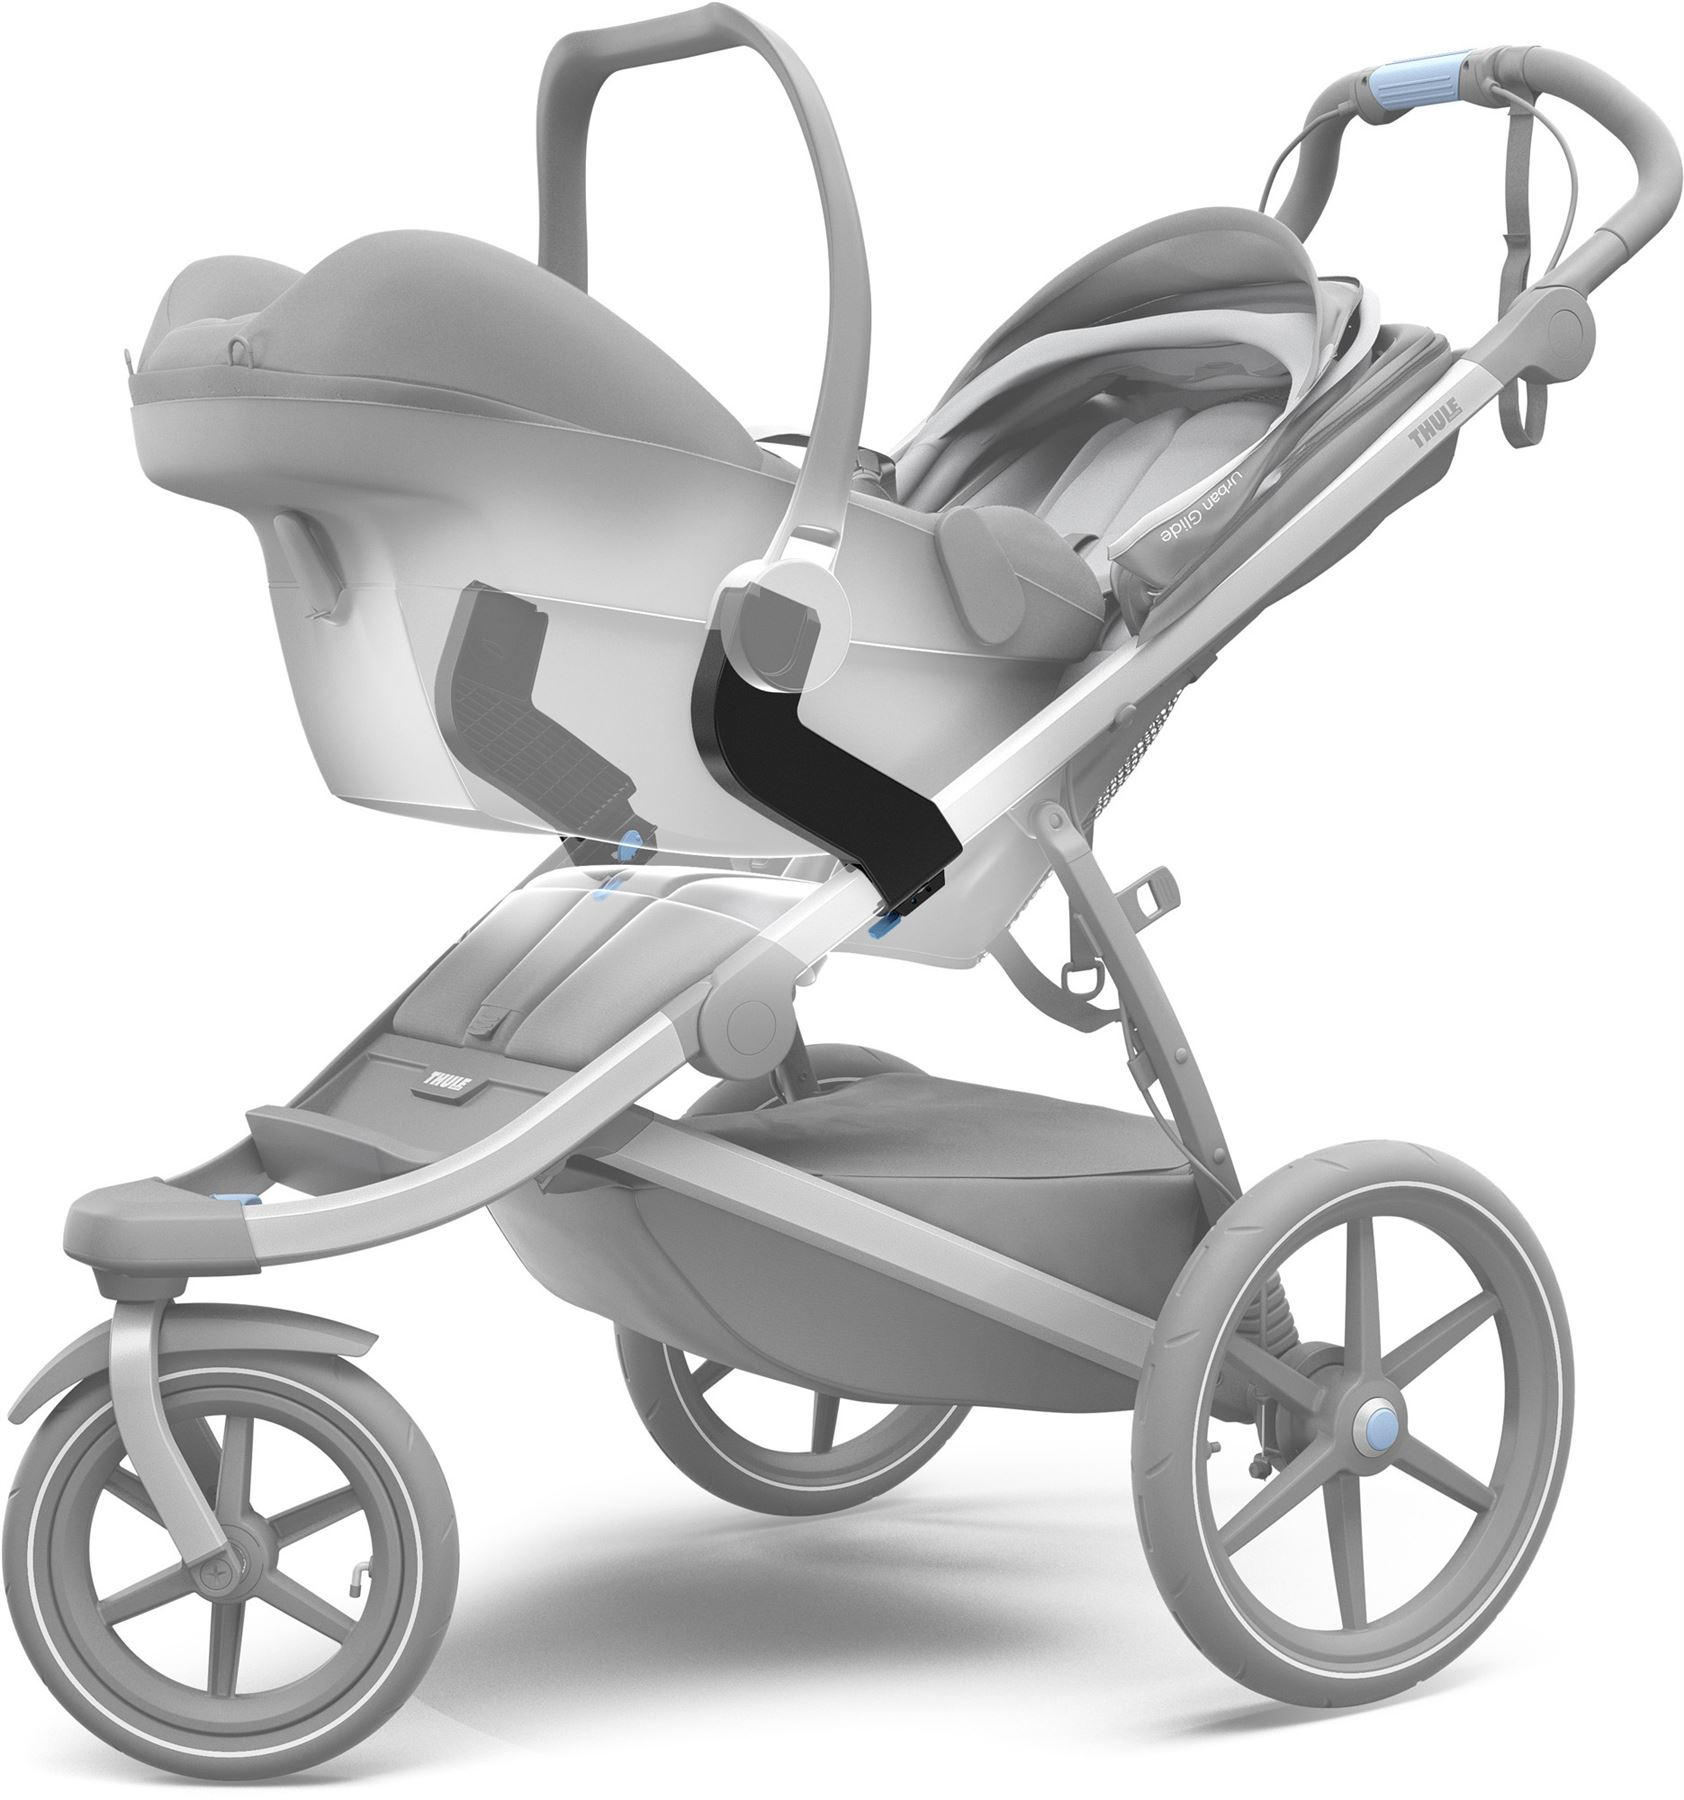 Kinderwagen Thule Details About Thule Urban Glide Car